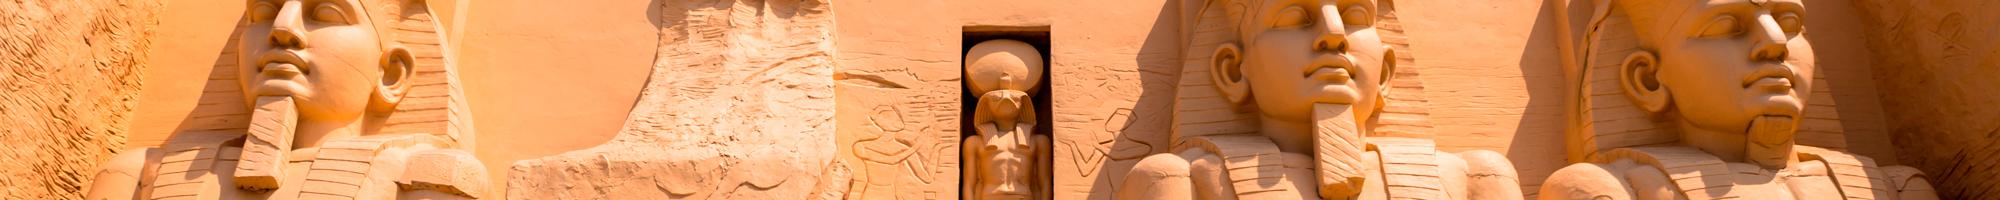 Hoteles en Sharm El Sheikh